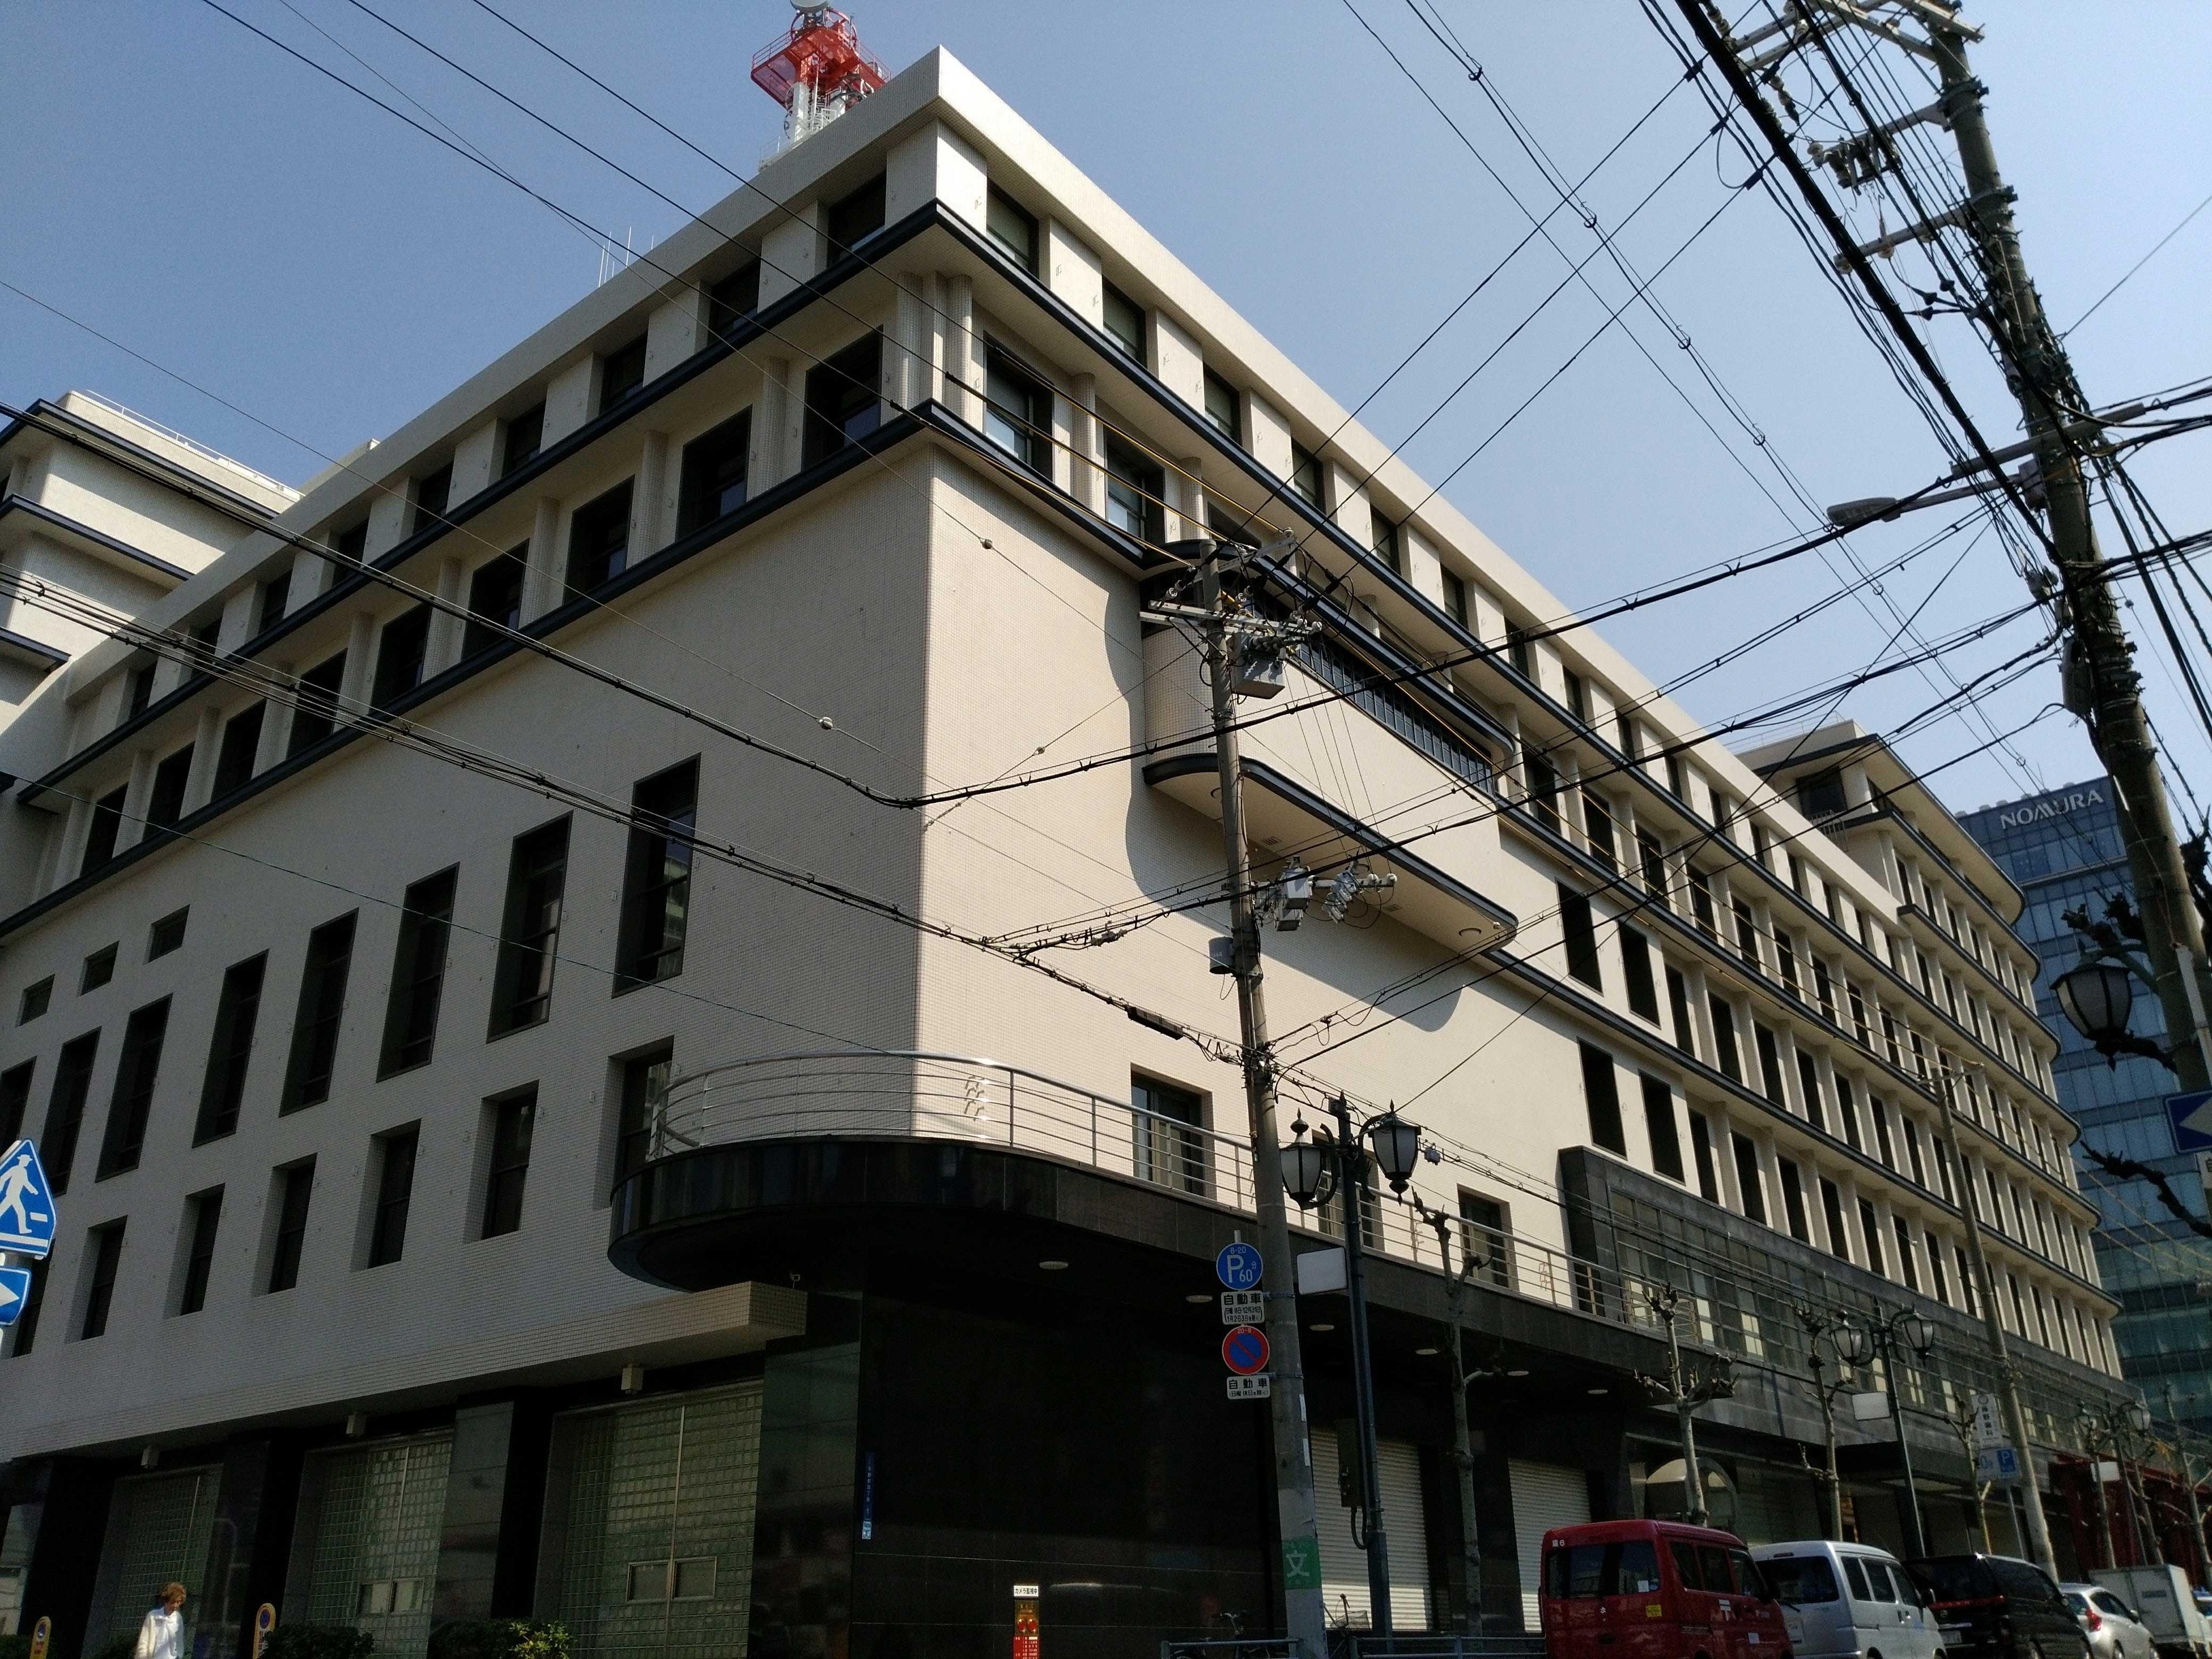 <p>南西面</p>竣工当時2階にあった講演場の避難バルコニーがデザインされている。